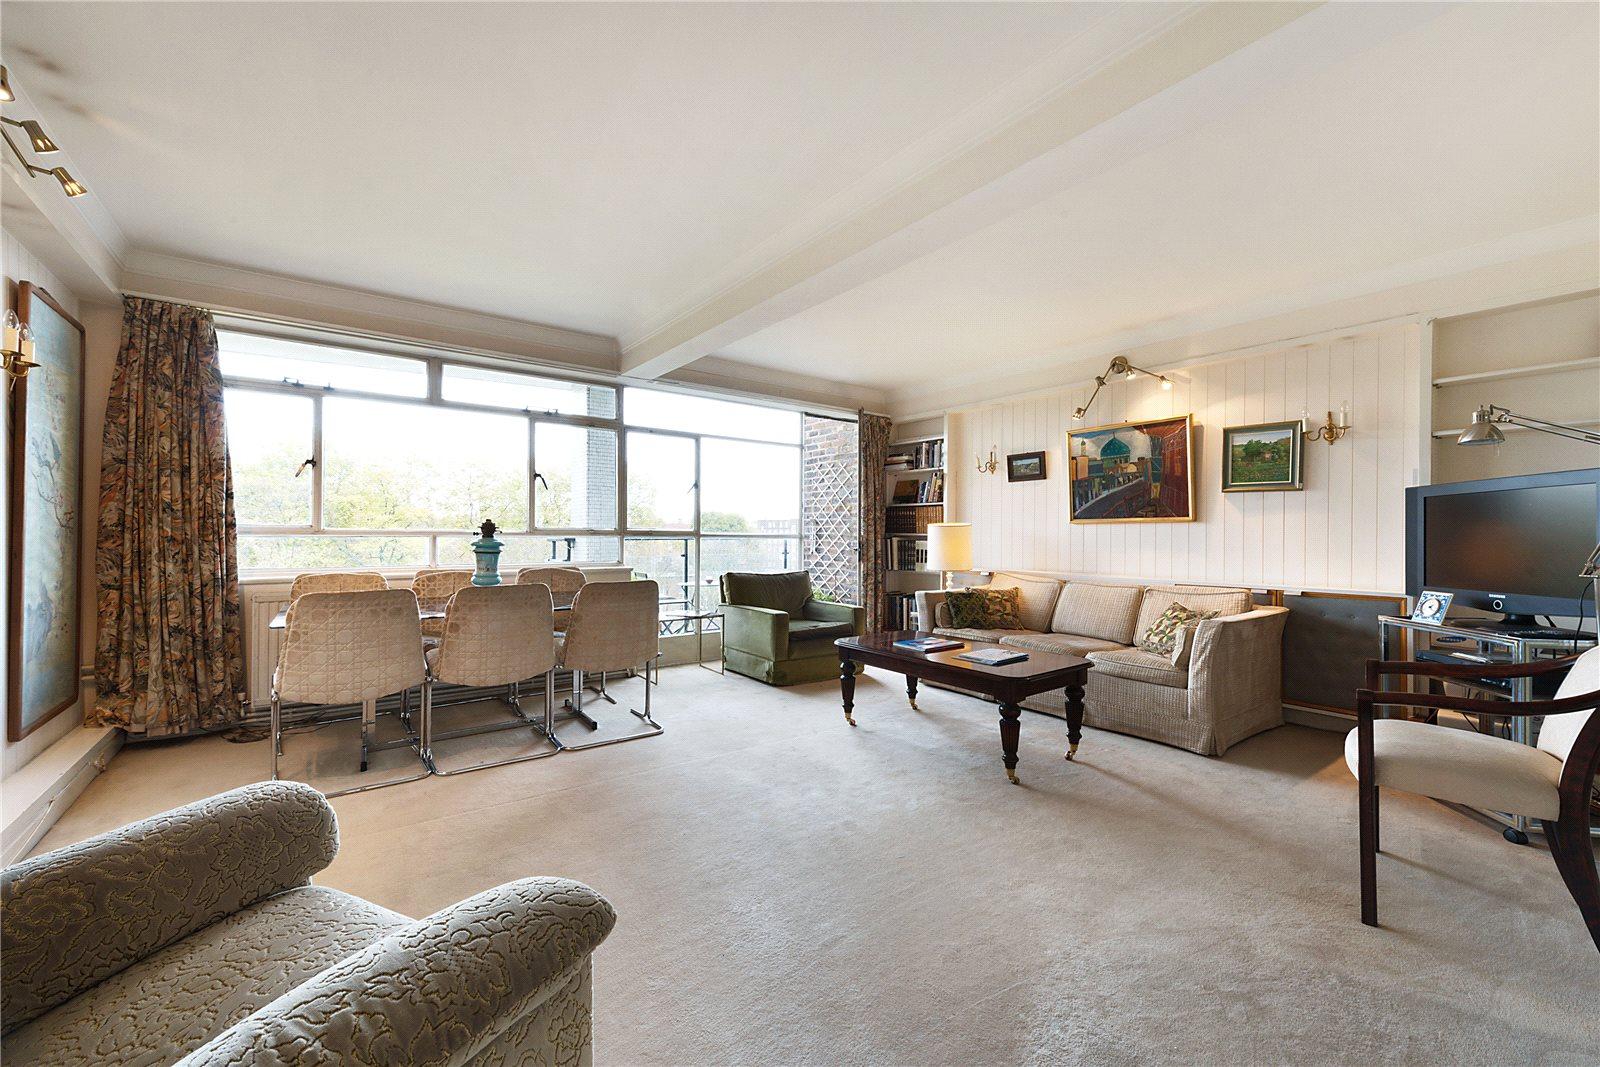 Apartments / Residences for Sale at Monckton Court, Strangways Terrace, Holland Park, London, W14 Holland Park, London, England